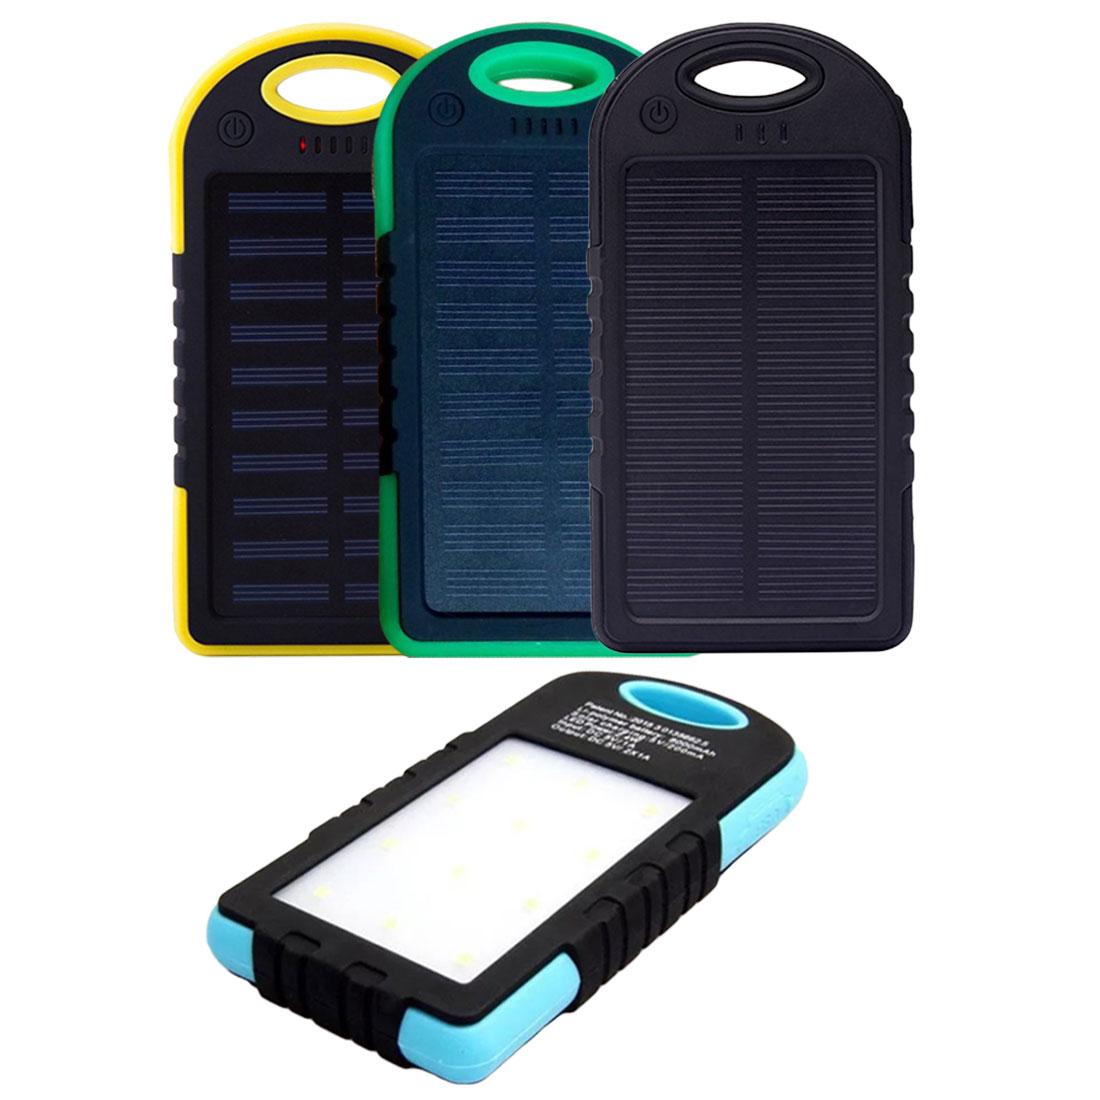 Portable Power Bankbattery Charger Circuit Board Portable Power Bank